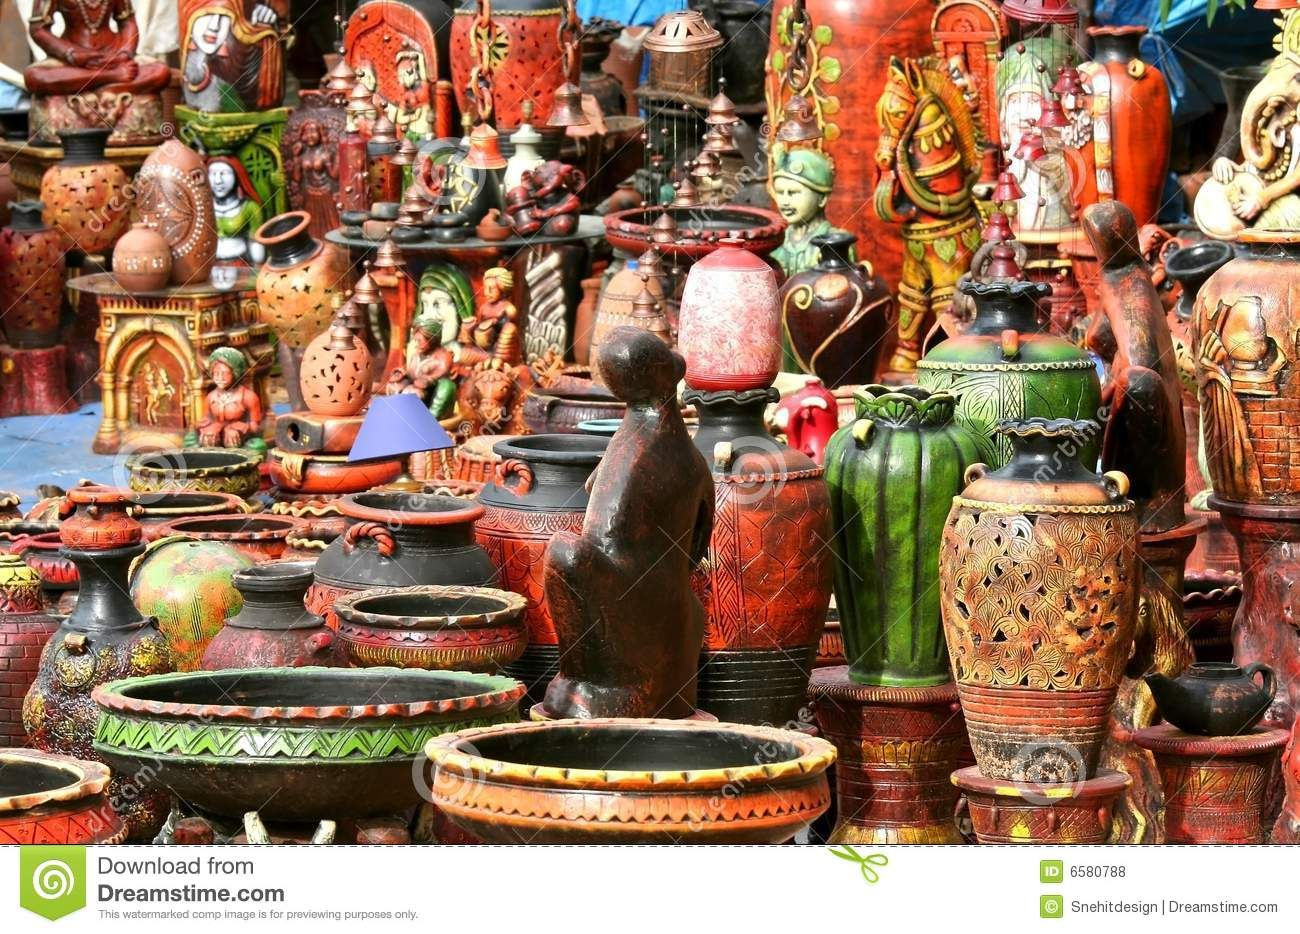 Kerala Handicrafts Google Search Kerala Indian Fashion Indian